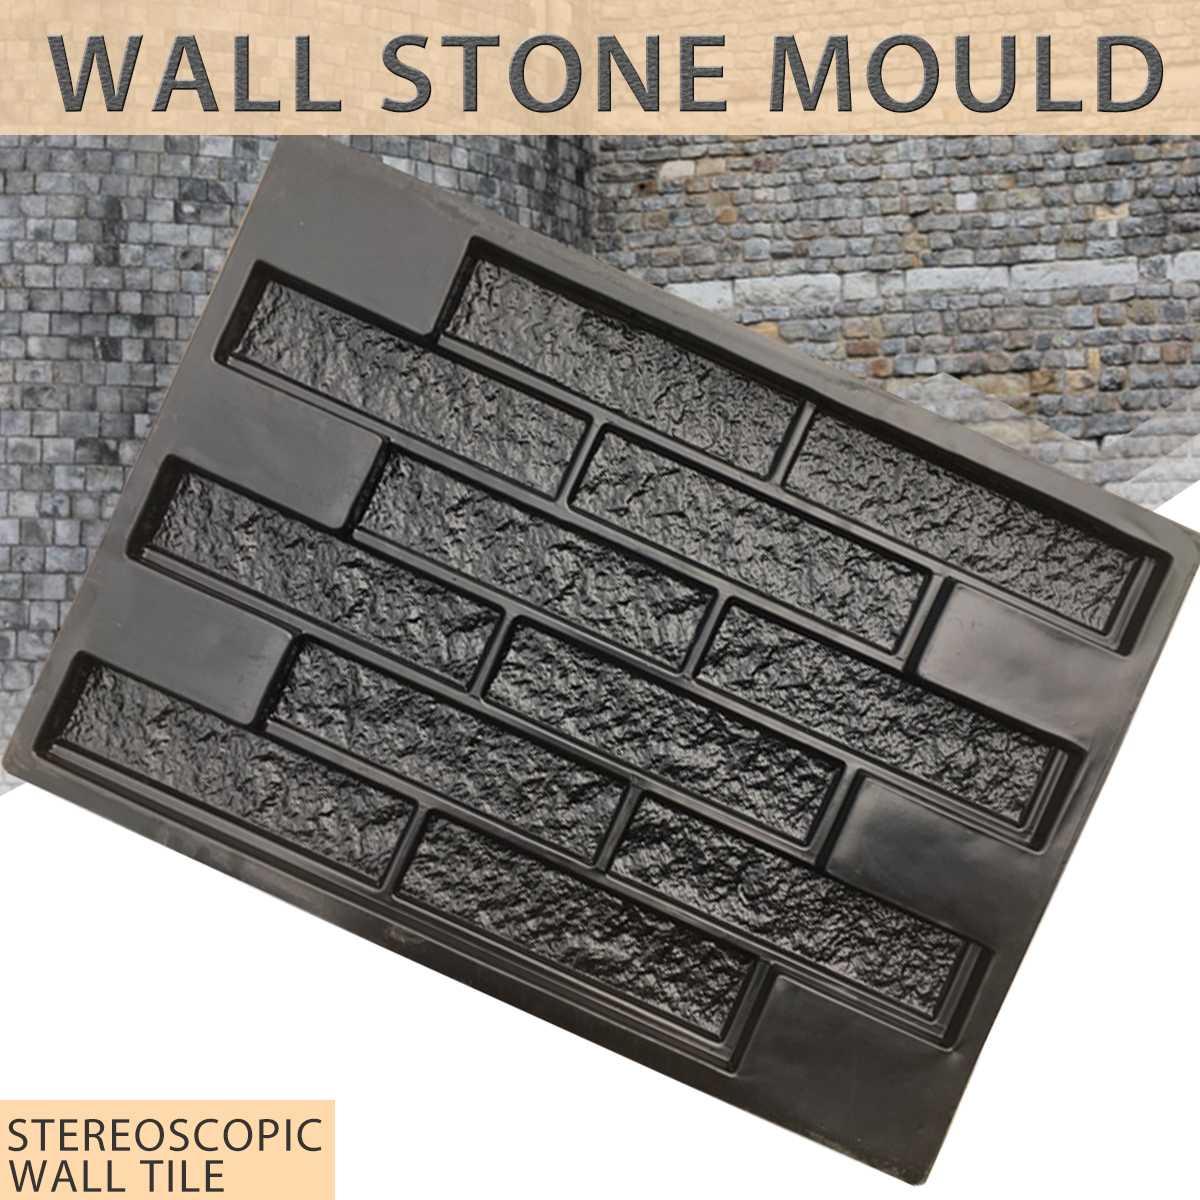 Plastic Molds wall Concrete Plaster Garden House Wall Stone Tiles Stone Mold Cement Bricks Maker Mould 69 49cm Decorative